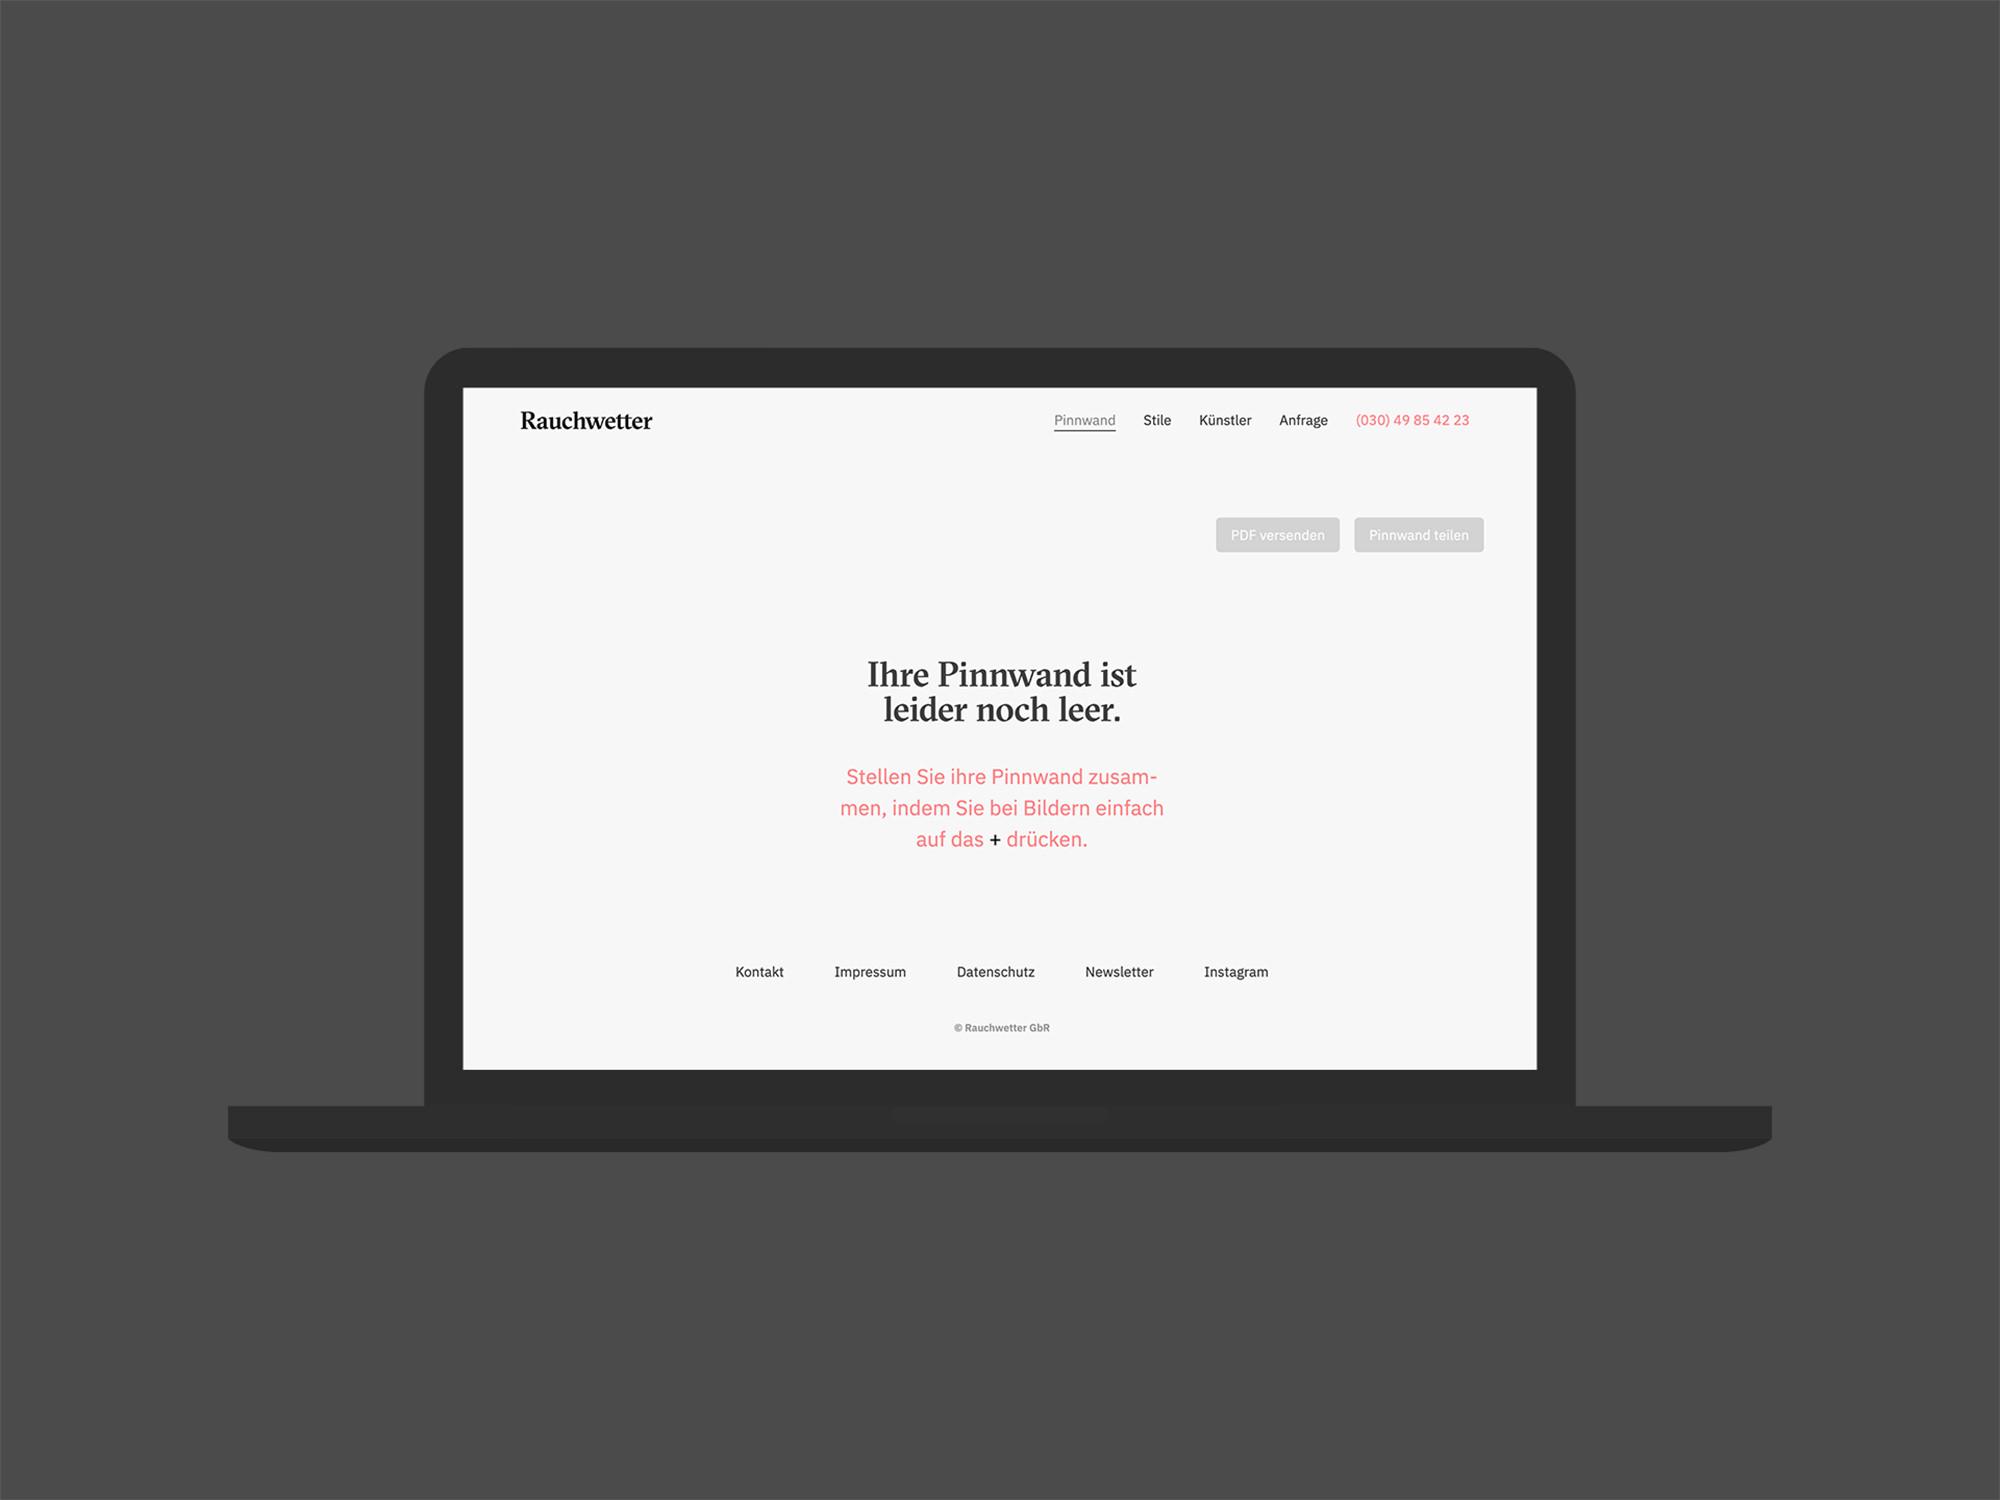 Web 04 (Rauchwetter, Corporate Design)